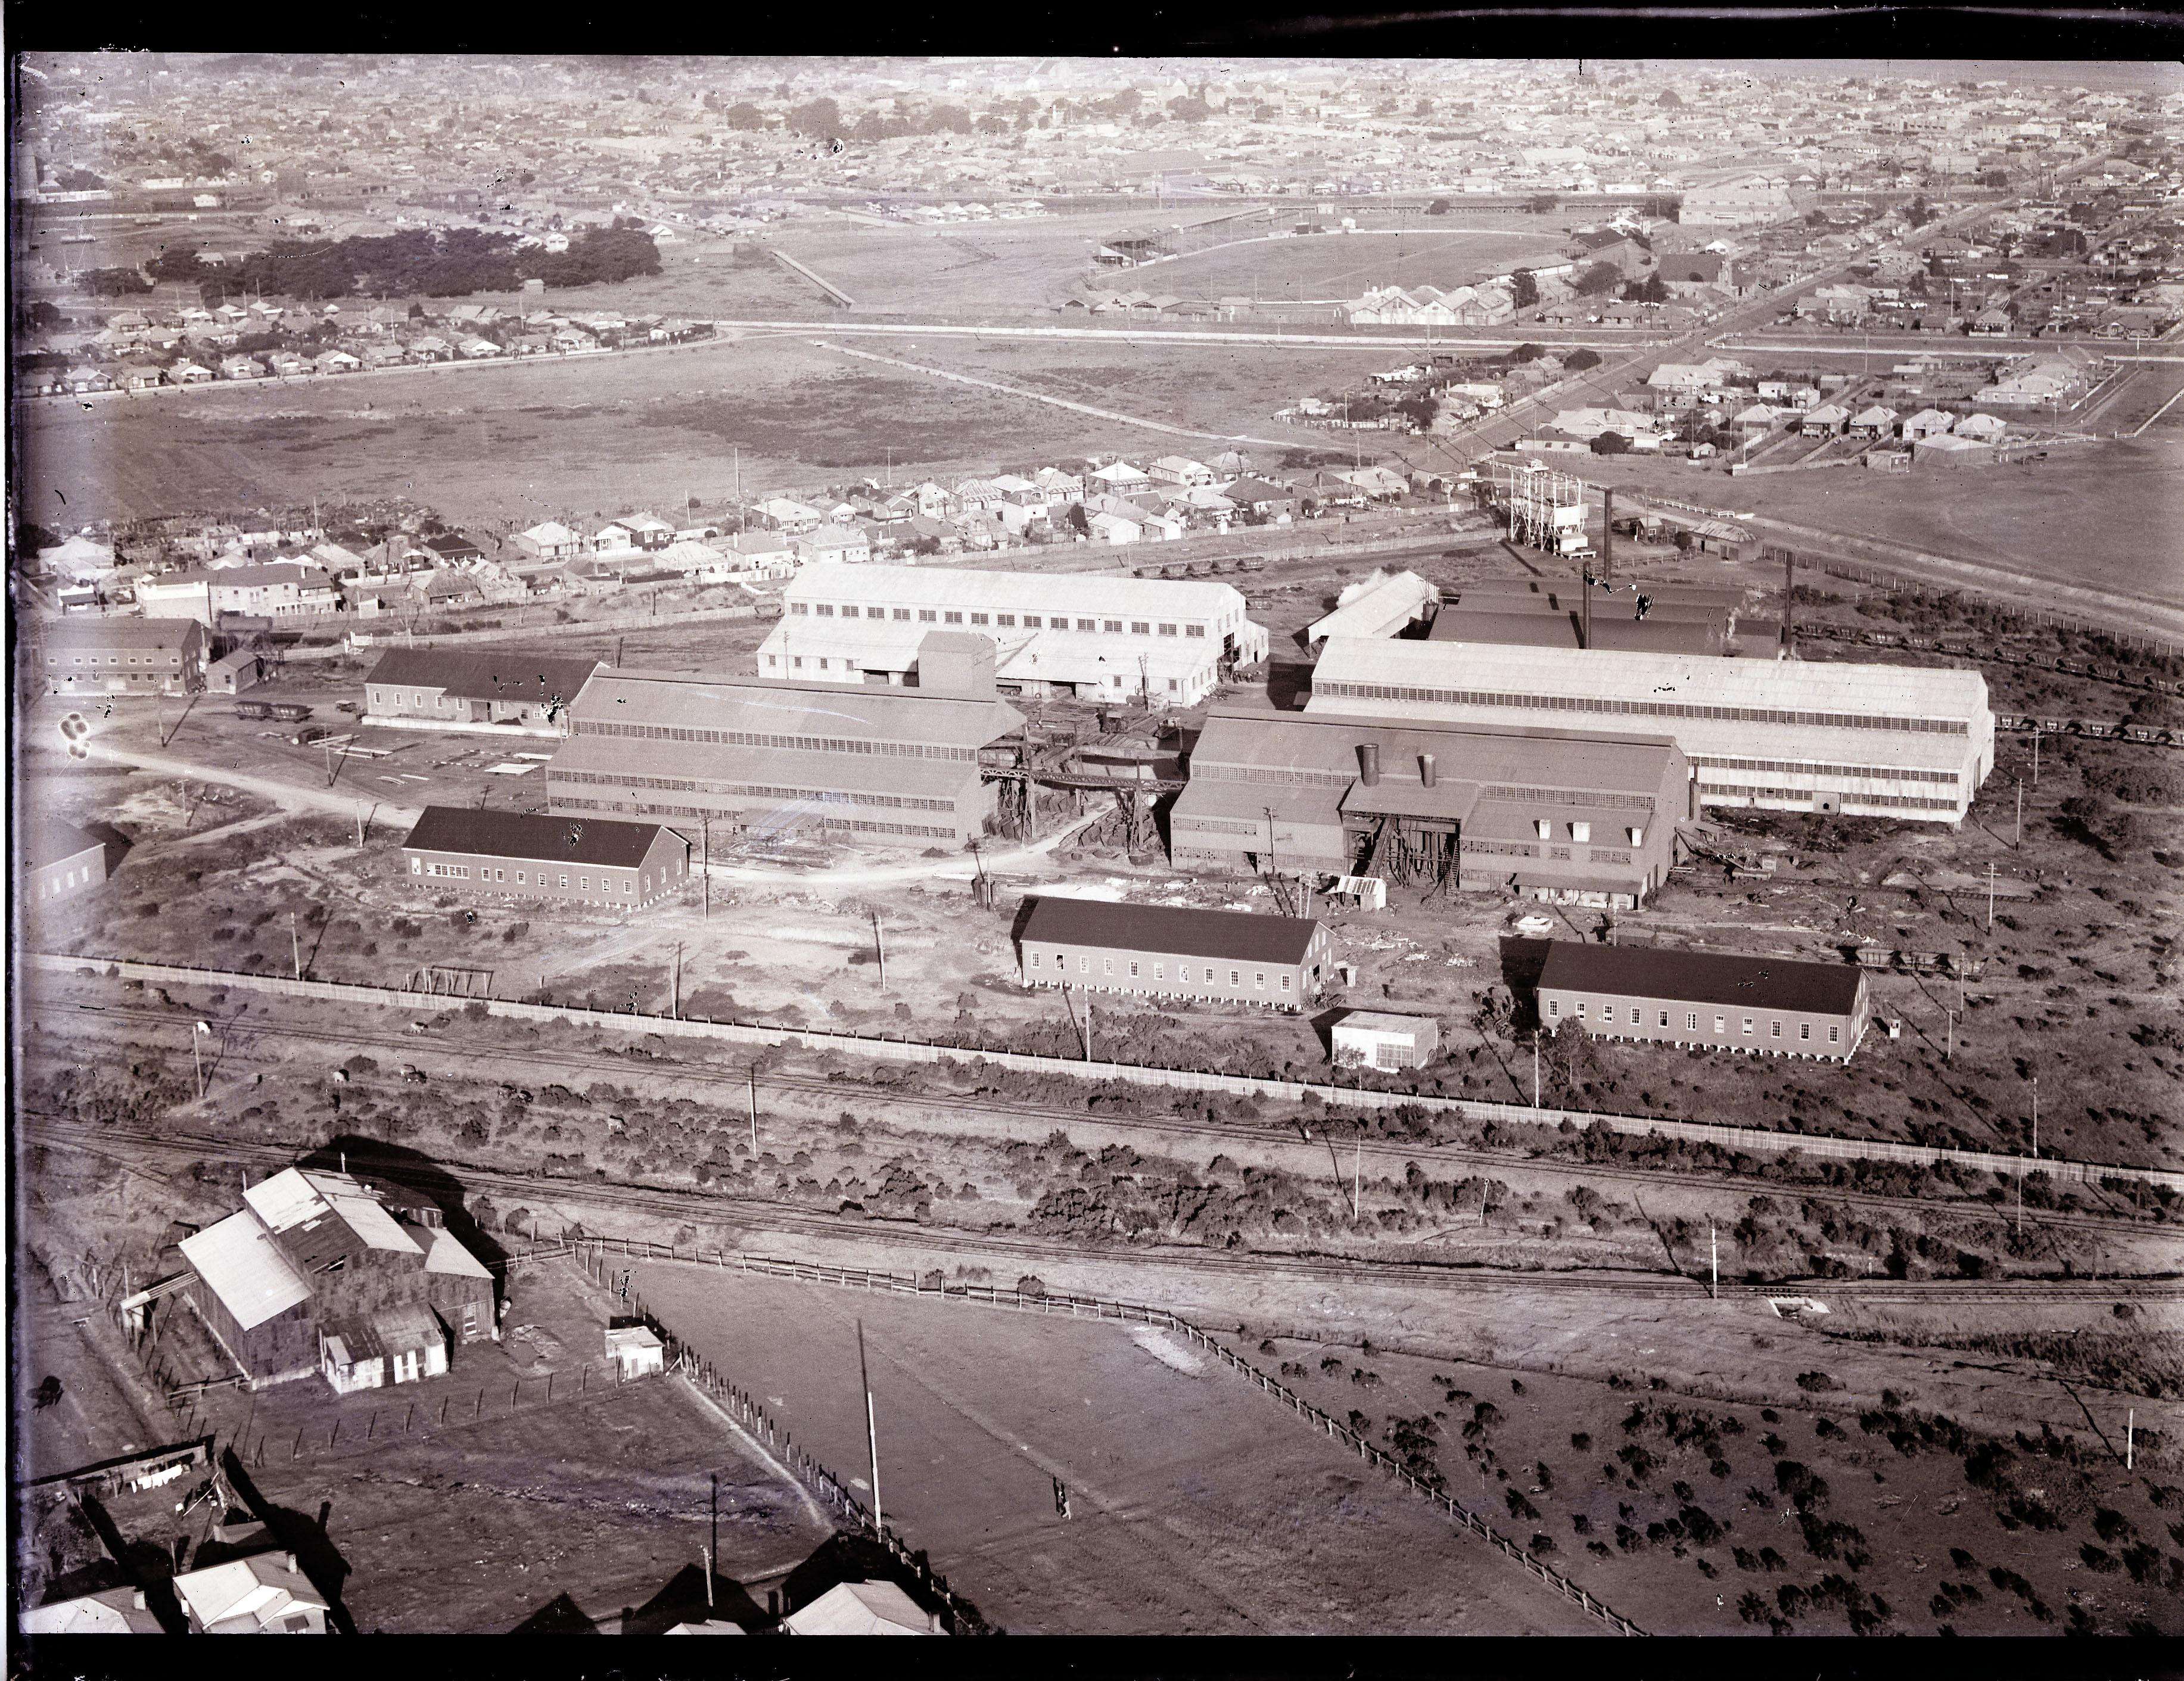 Newcastle aerial, 1935 (Image 71 Courtesy of Phillip Warren)